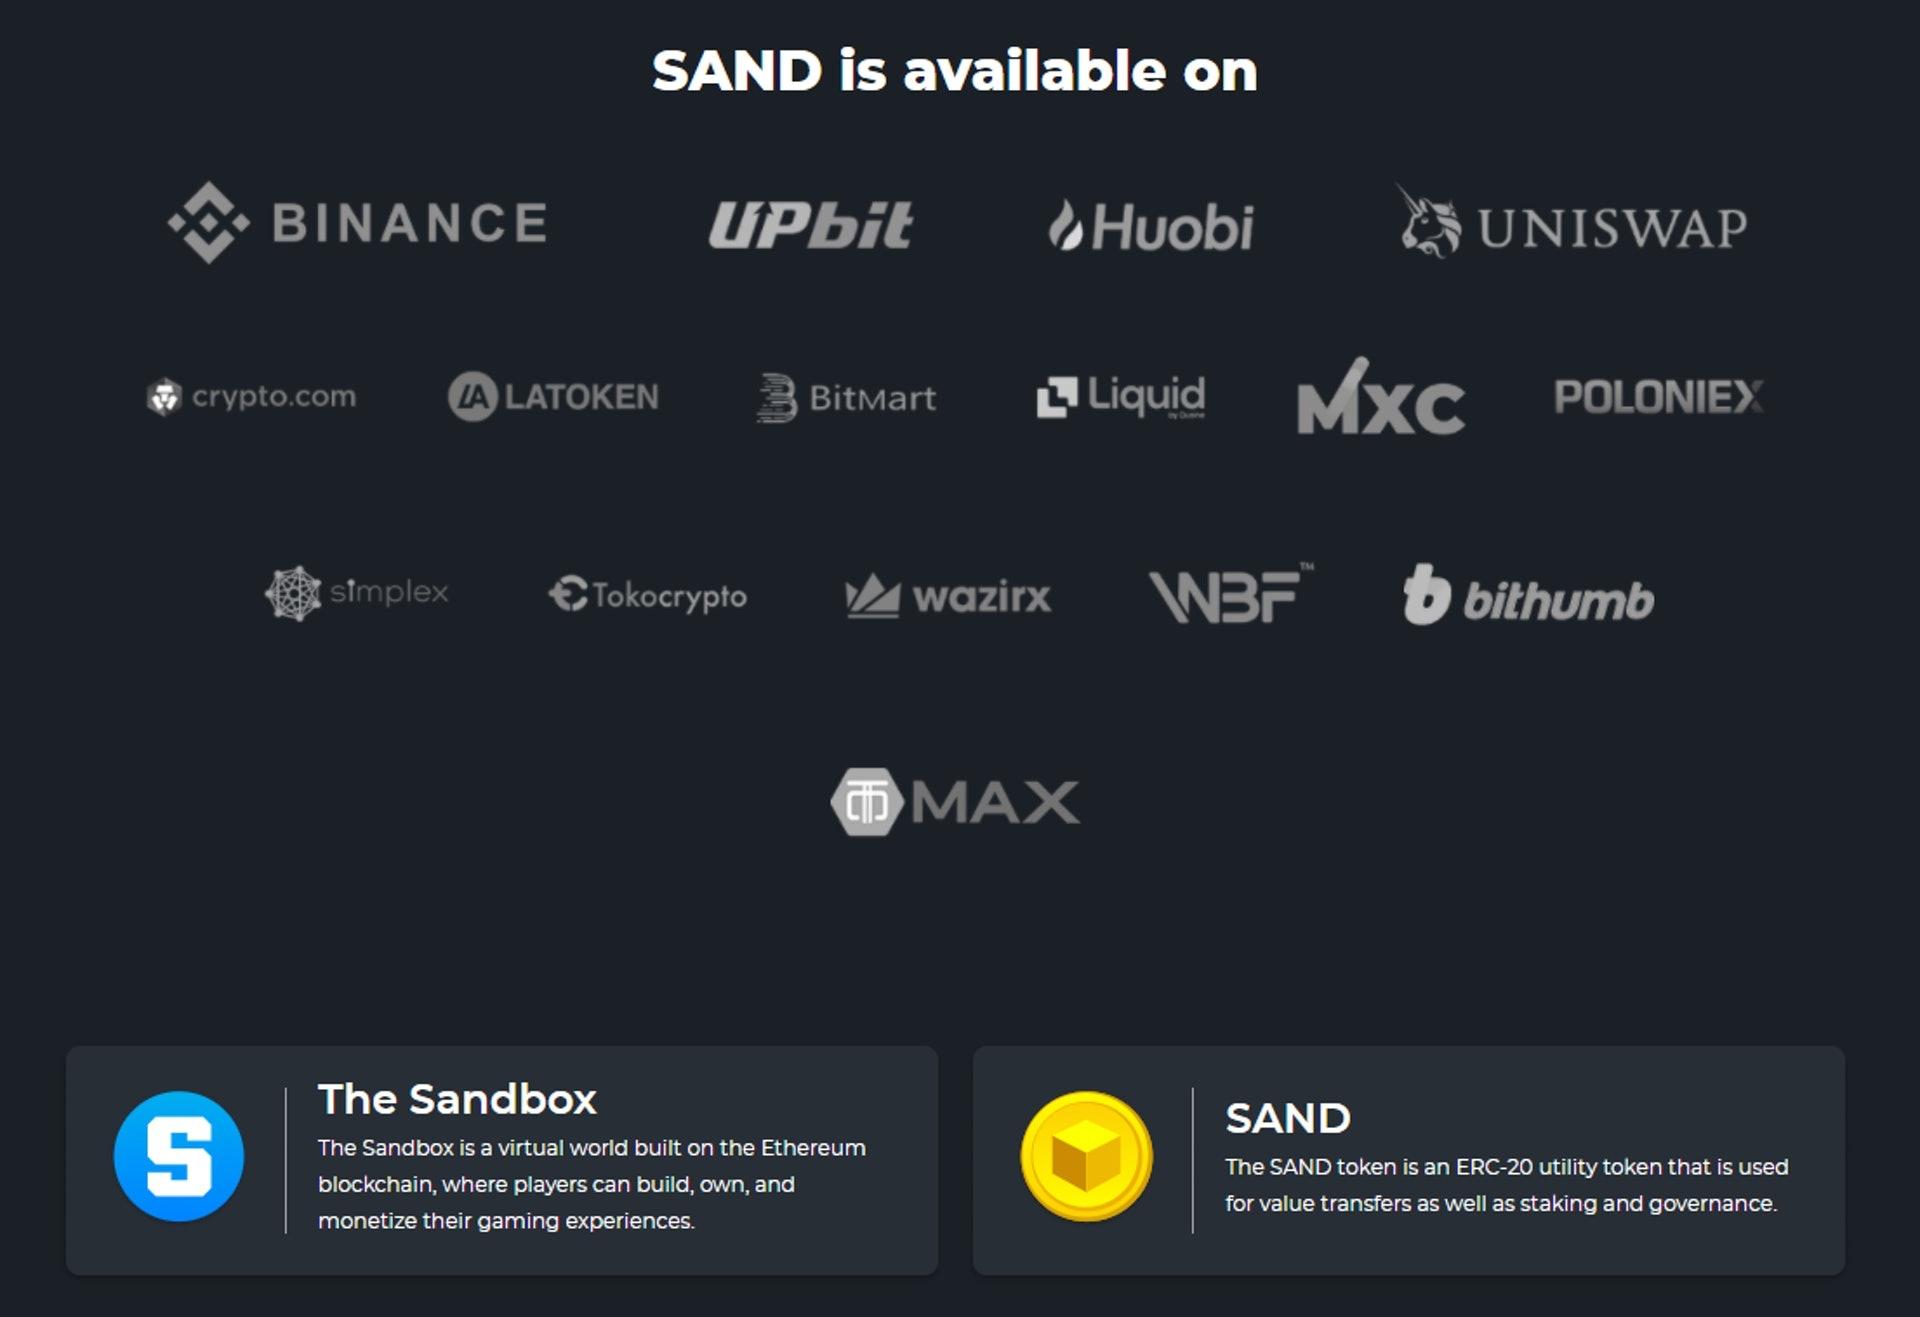 SAND是《The Sandbox》世界中通用的加密貨幣,現已可以在幣安(Binance)、Upbit、火幣網(Huobi)等加密貨幣交易所兌換成其他幣種。(The Sandbox)